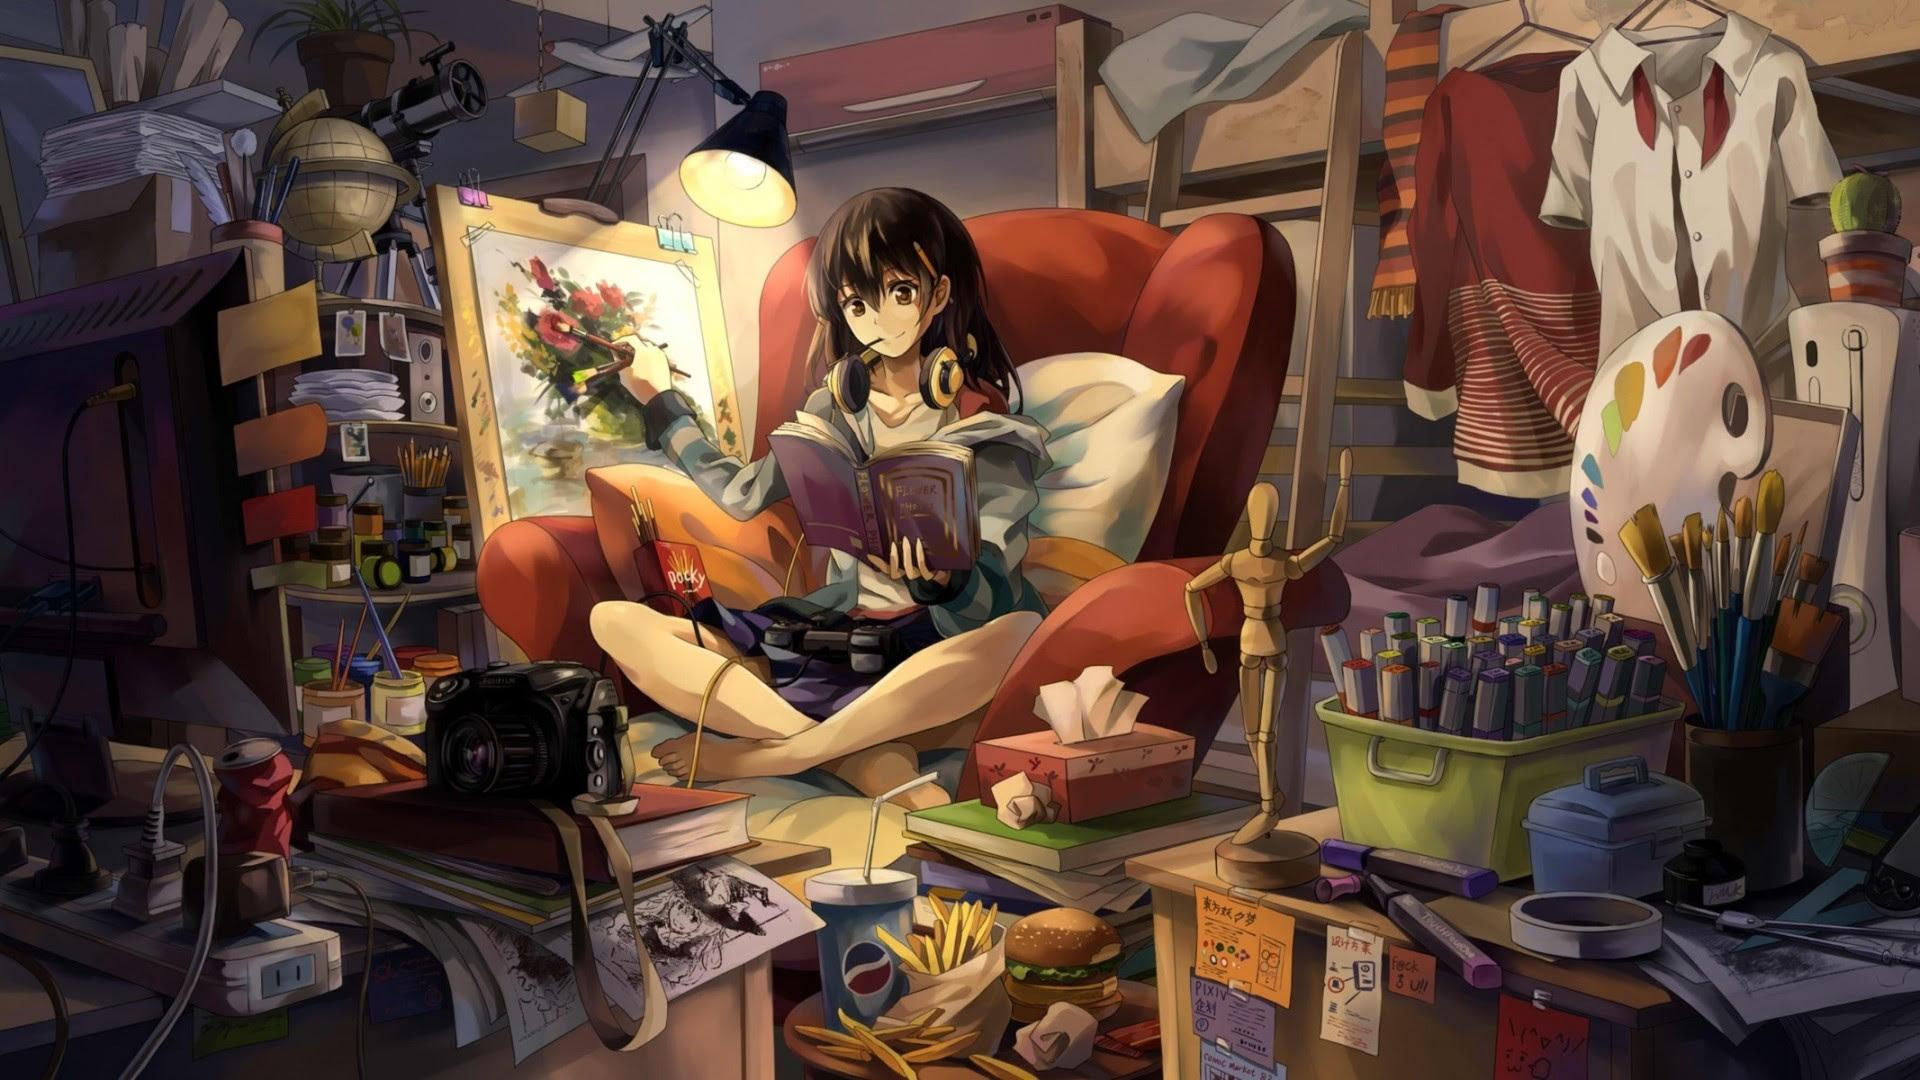 17 Gambar Anime Cowok Gamers Keren Arti Gambar